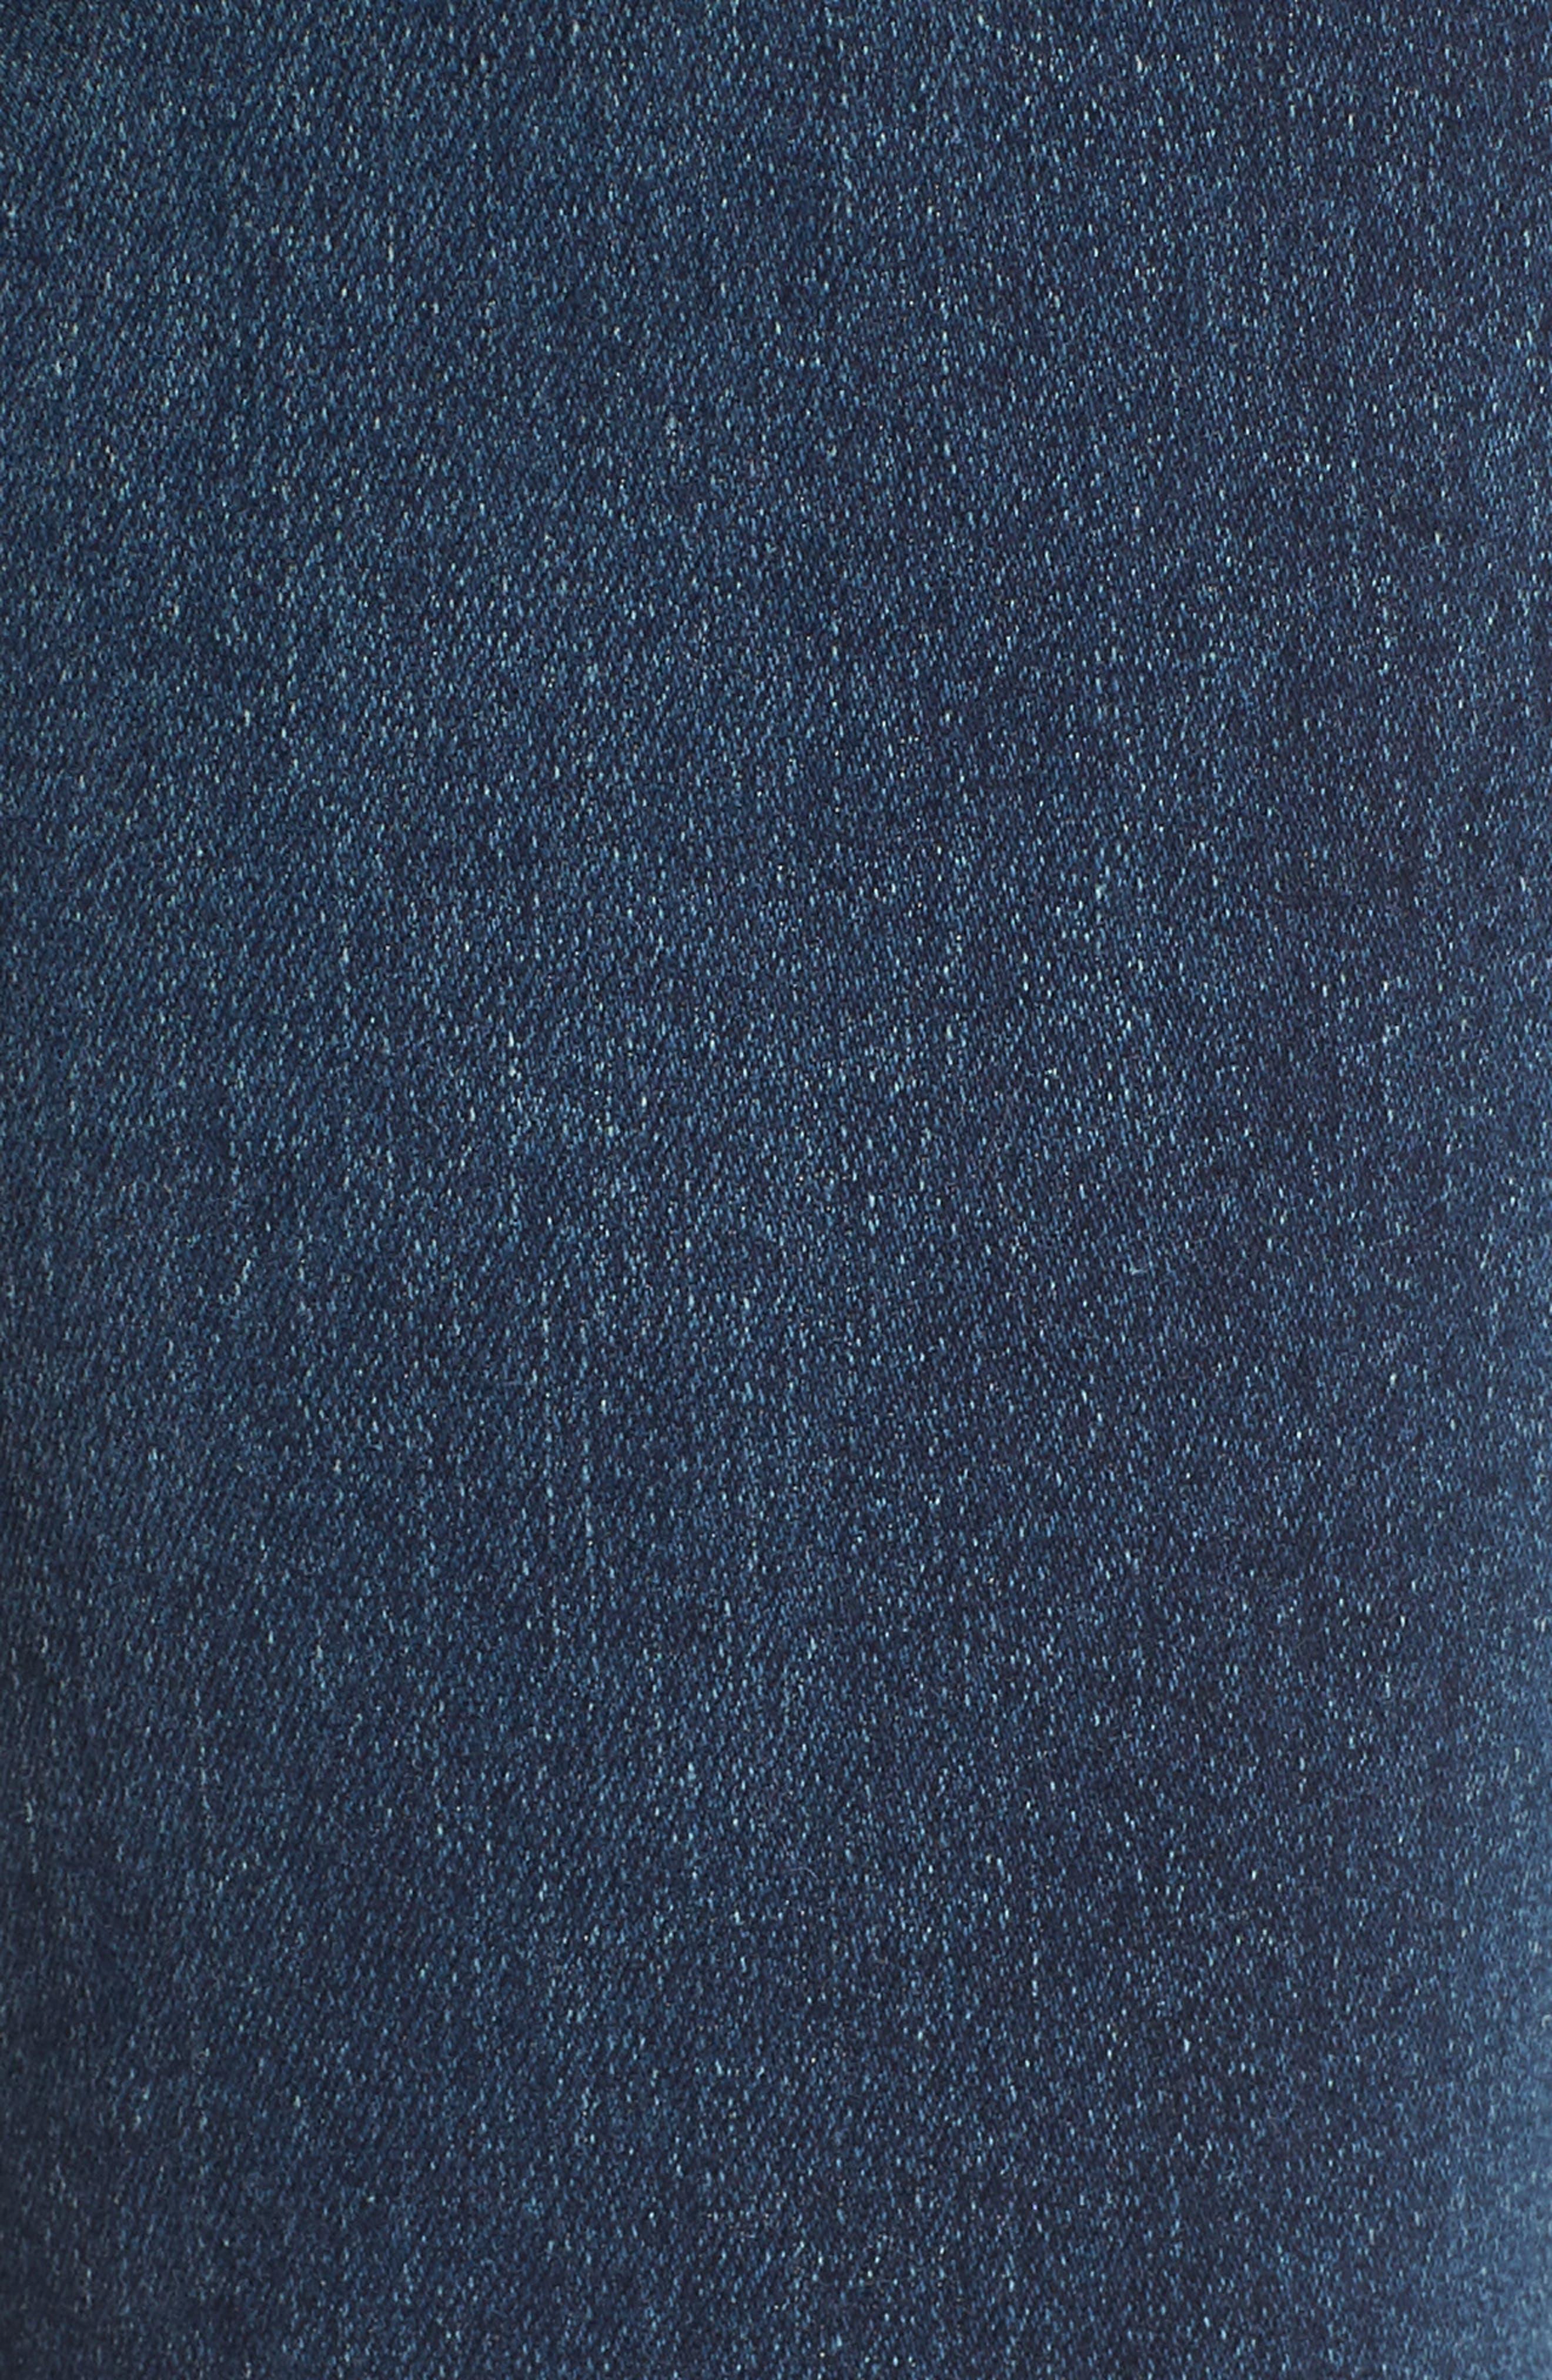 The Legging Ankle Super Skinny Jeans,                             Alternate thumbnail 6, color,                             10Y TRANSCENDANCE